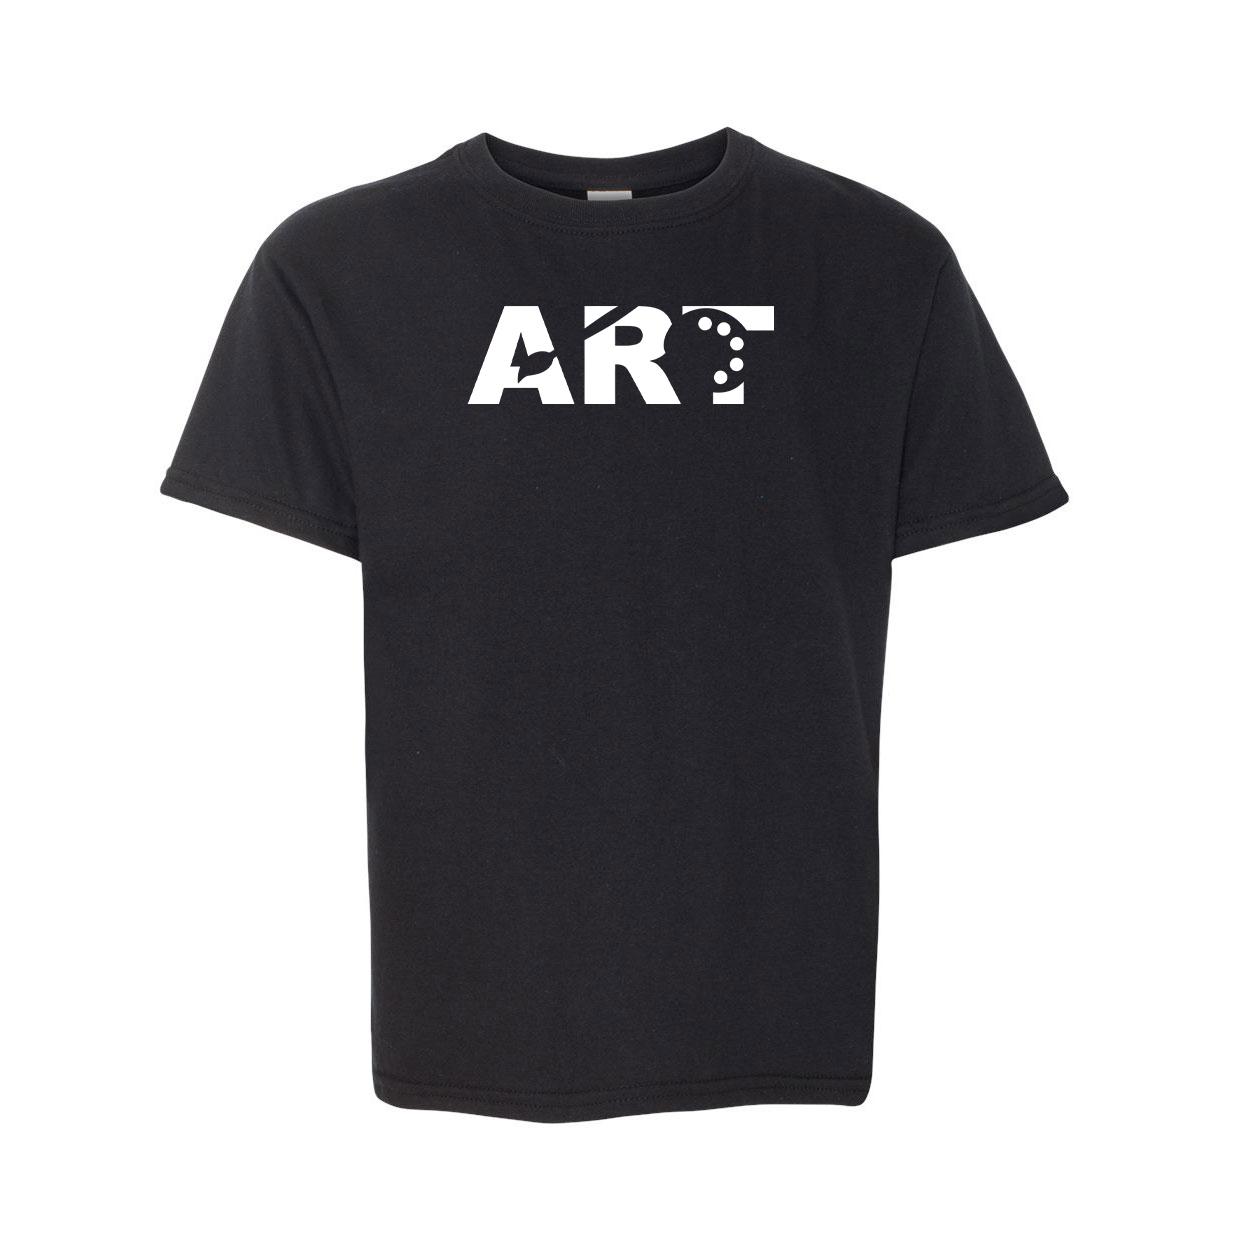 Lift California Classic Youth T-Shirt Black (White Logo)